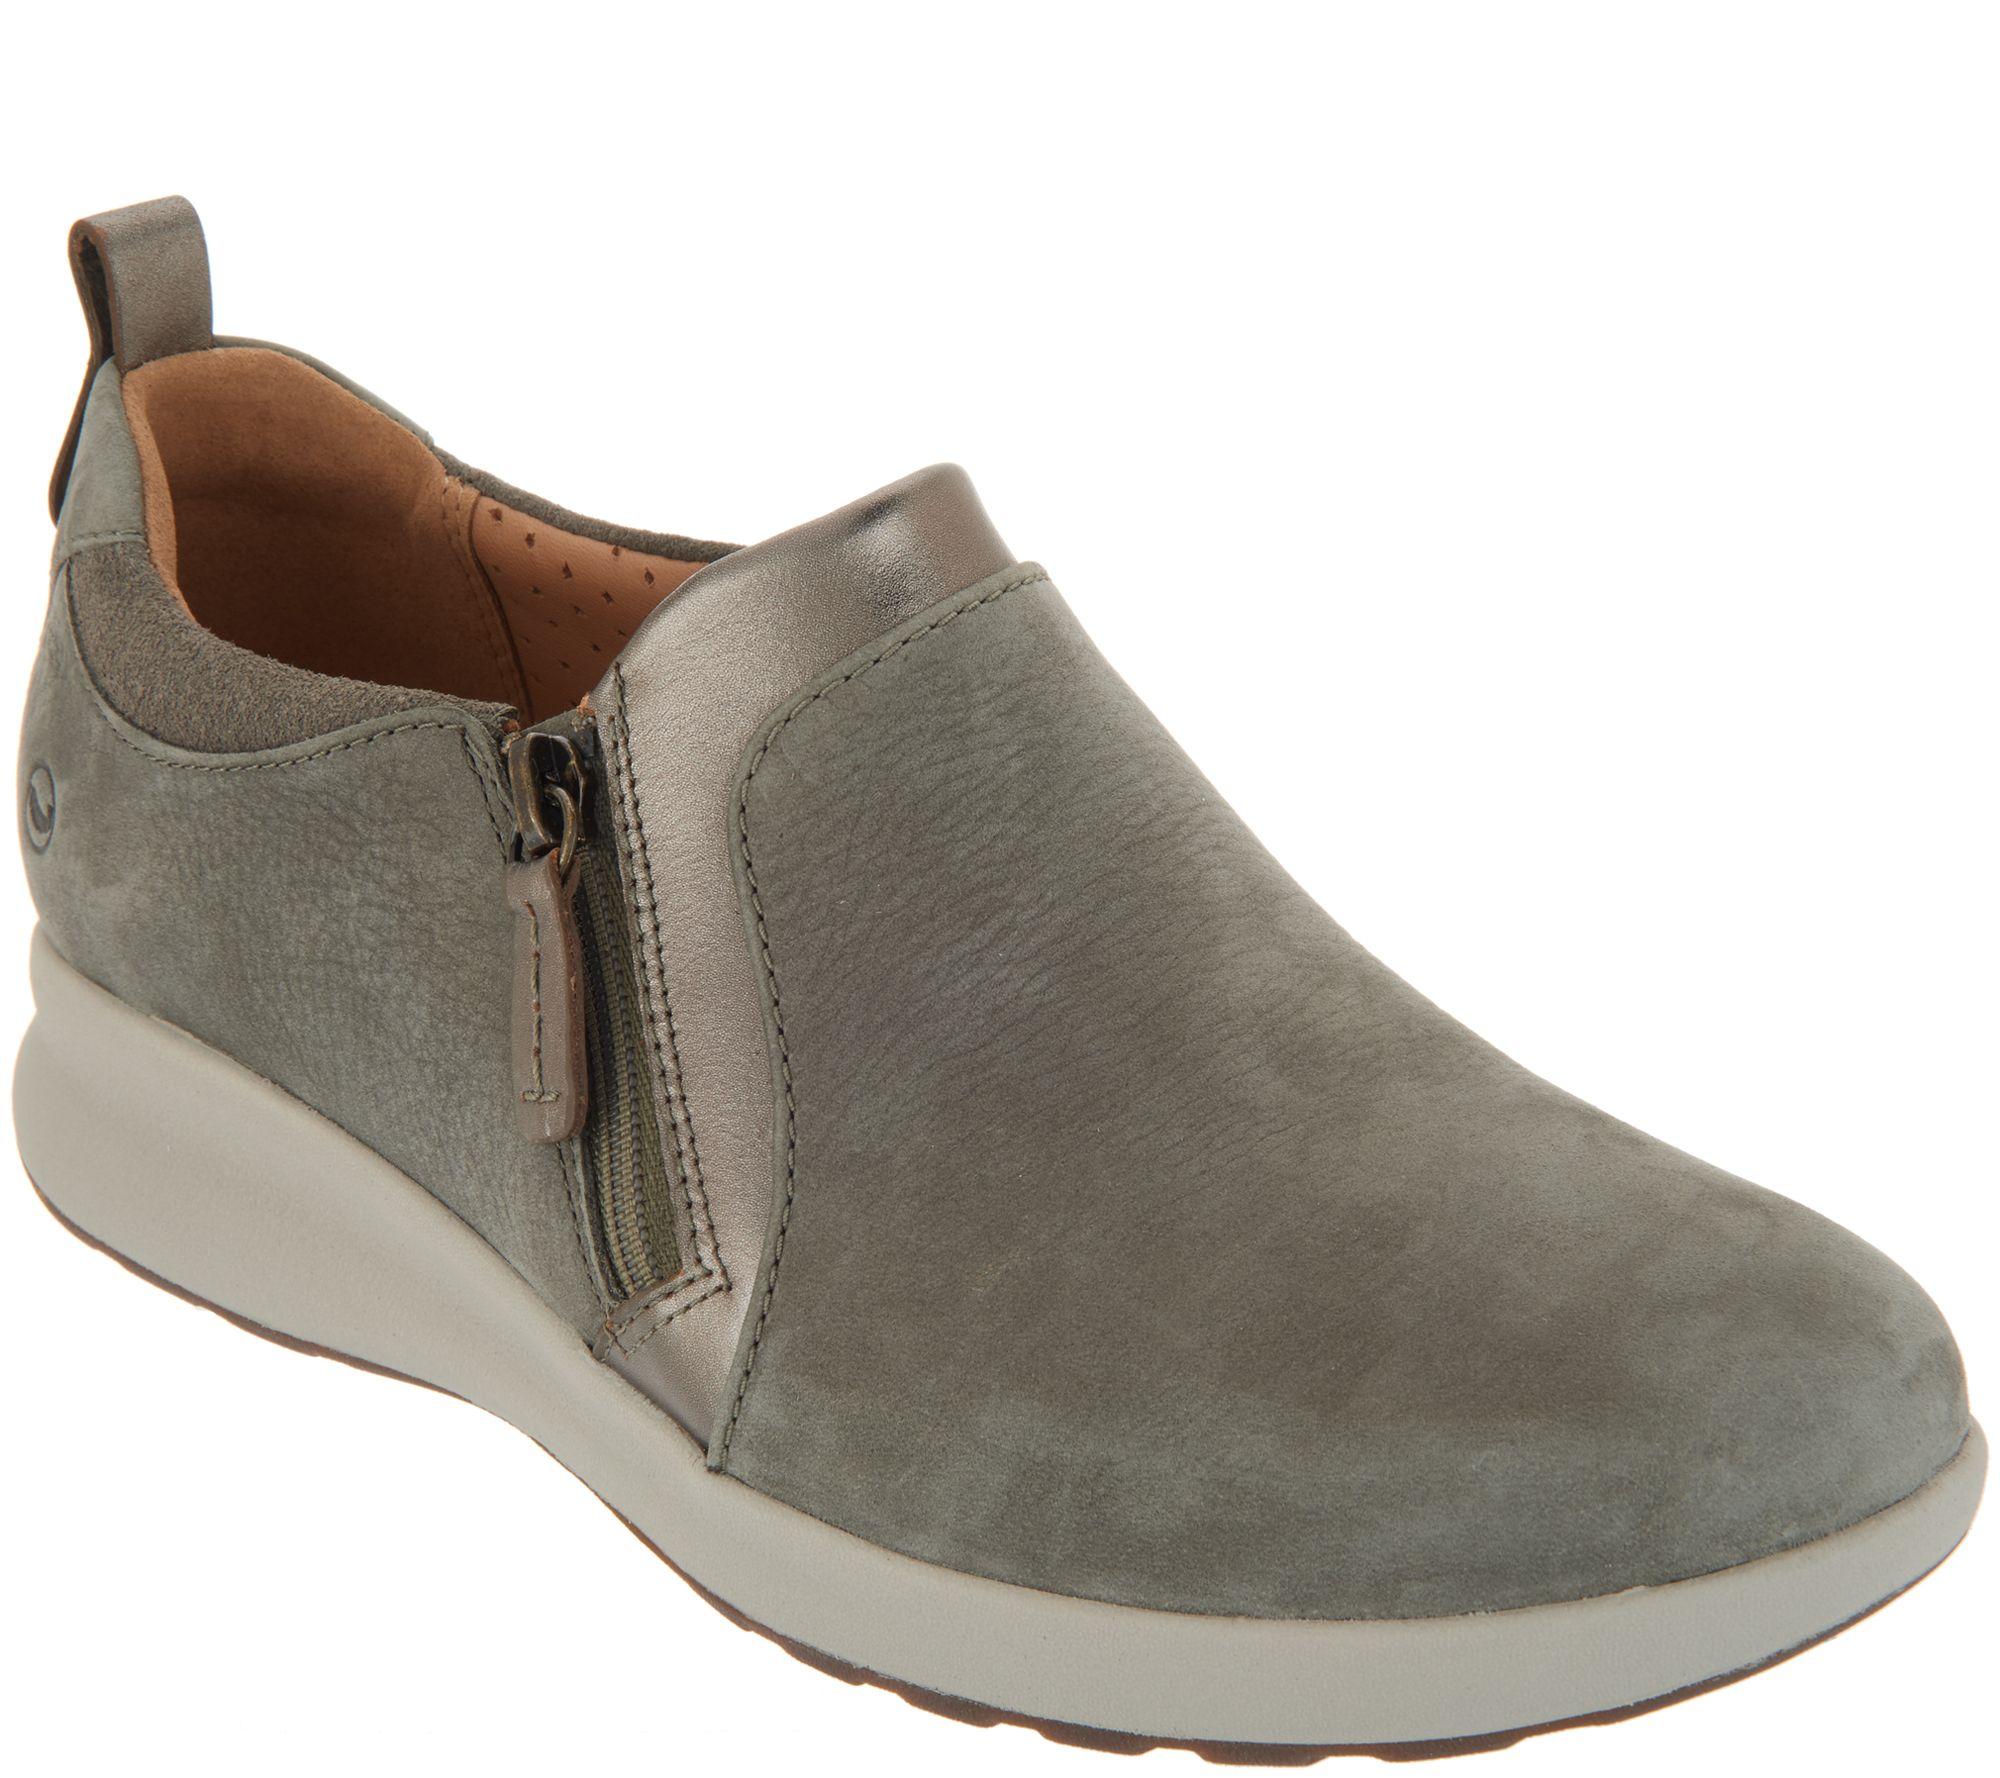 950b245cefe Clarks Unstructured Side-Zip Slip-On Shoes - Un.Adorn Zip - Page 1 — QVC.com